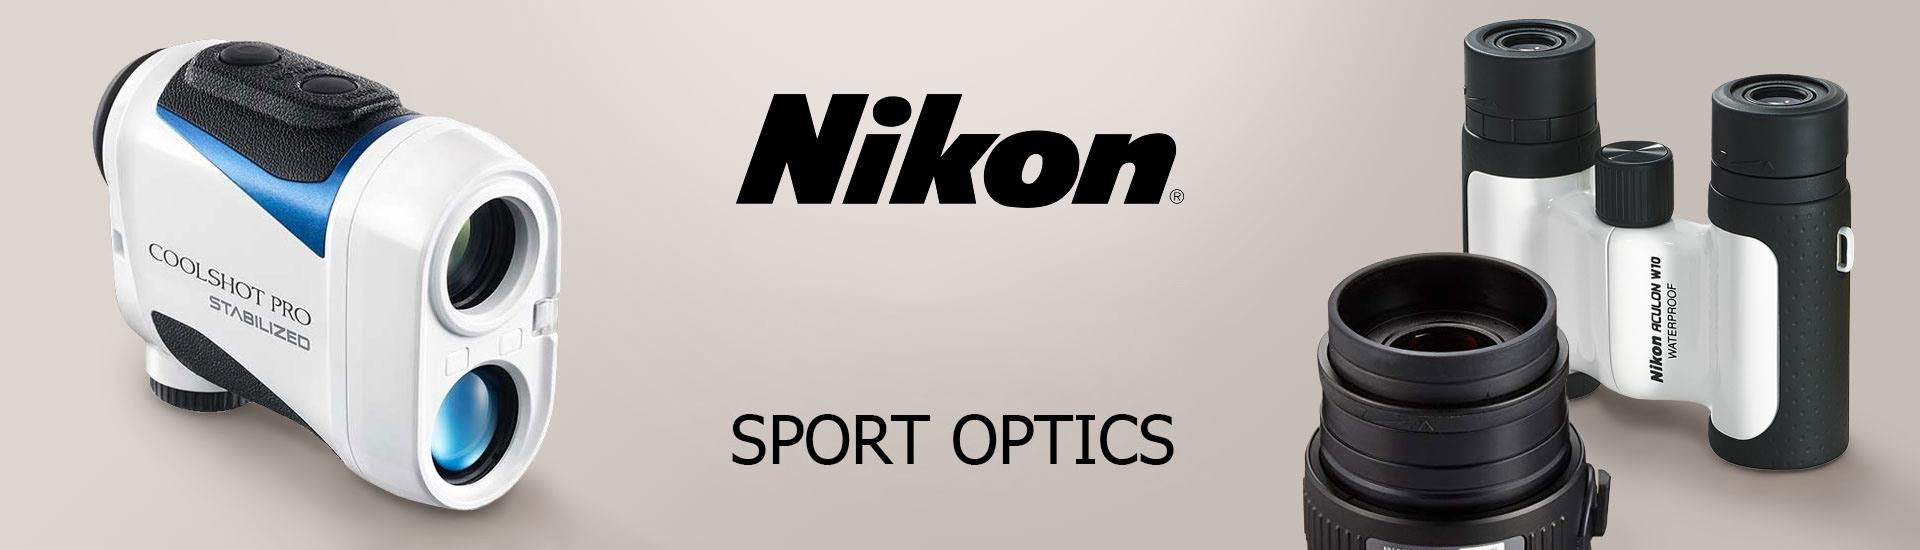 1800GunsAndAmmo com - The Amazon of Shooting Sports